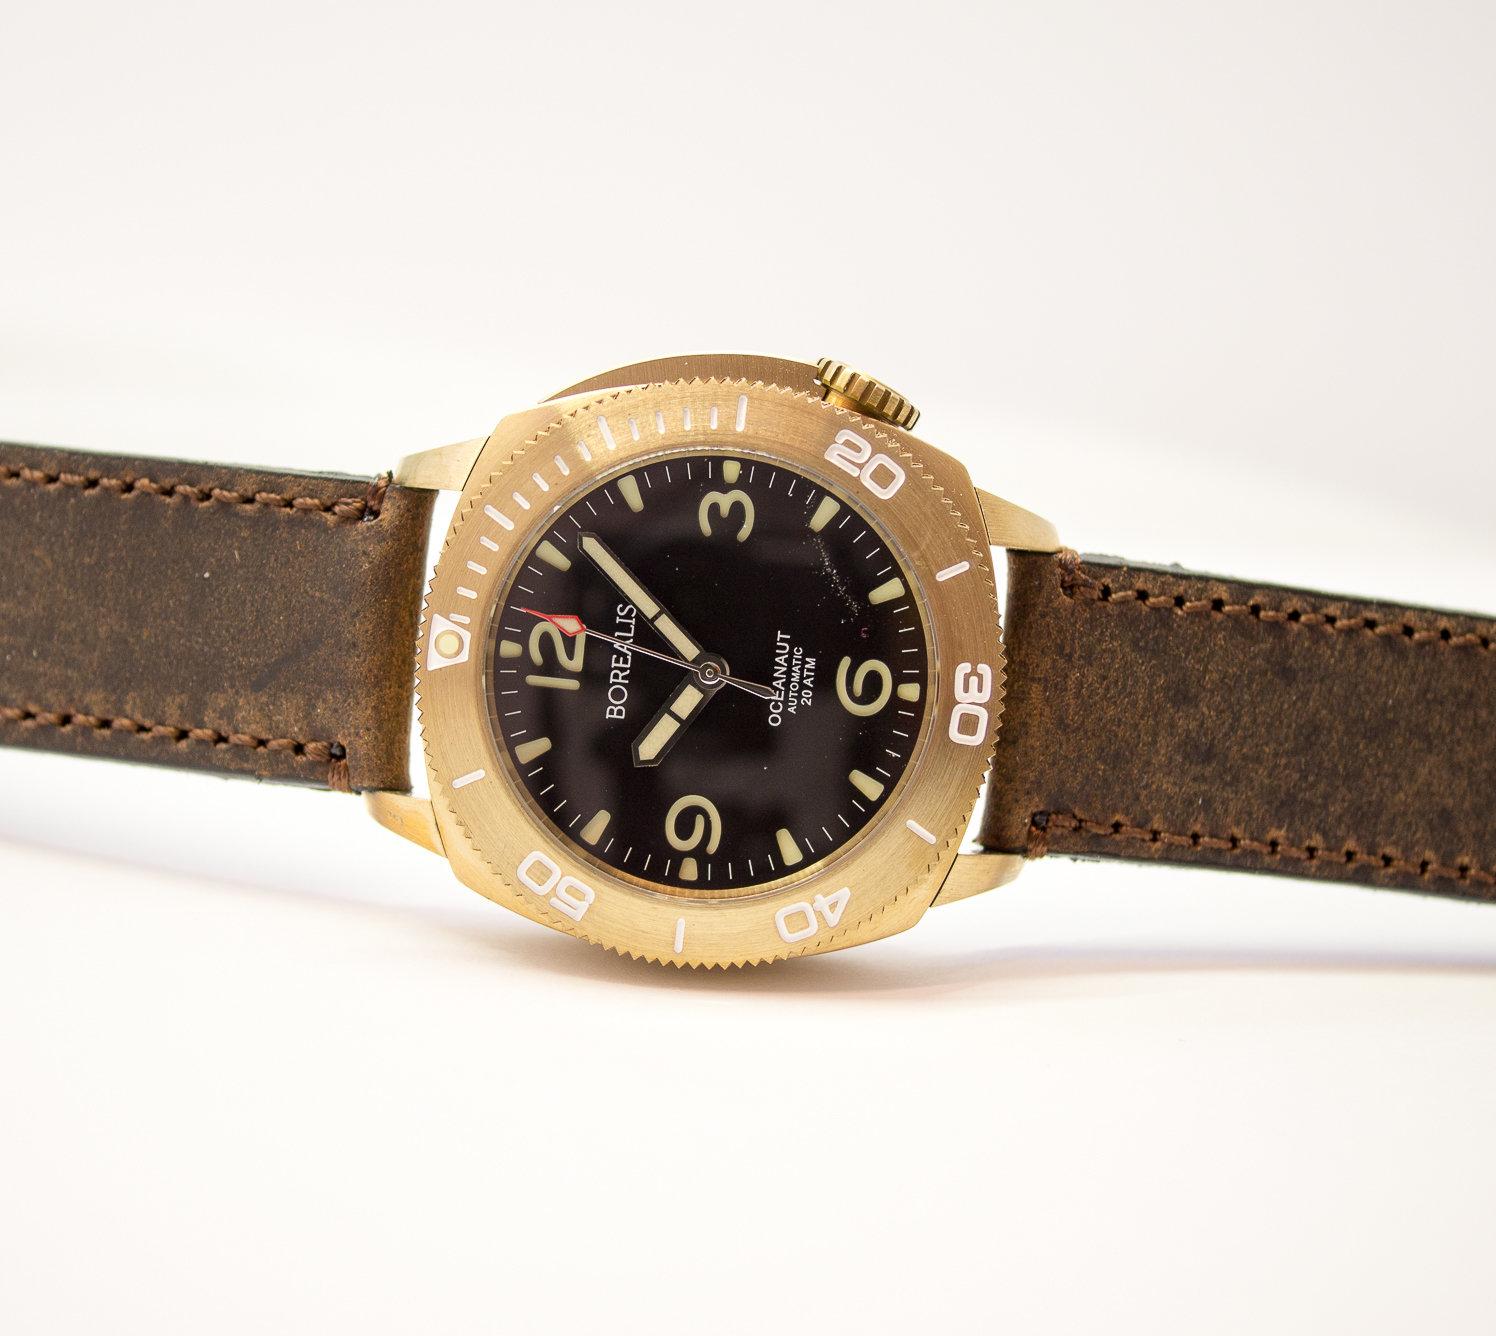 Borealis Oceanaut Aluminum Bronze Black No Date 200m NH35 Automatic Diver Watch